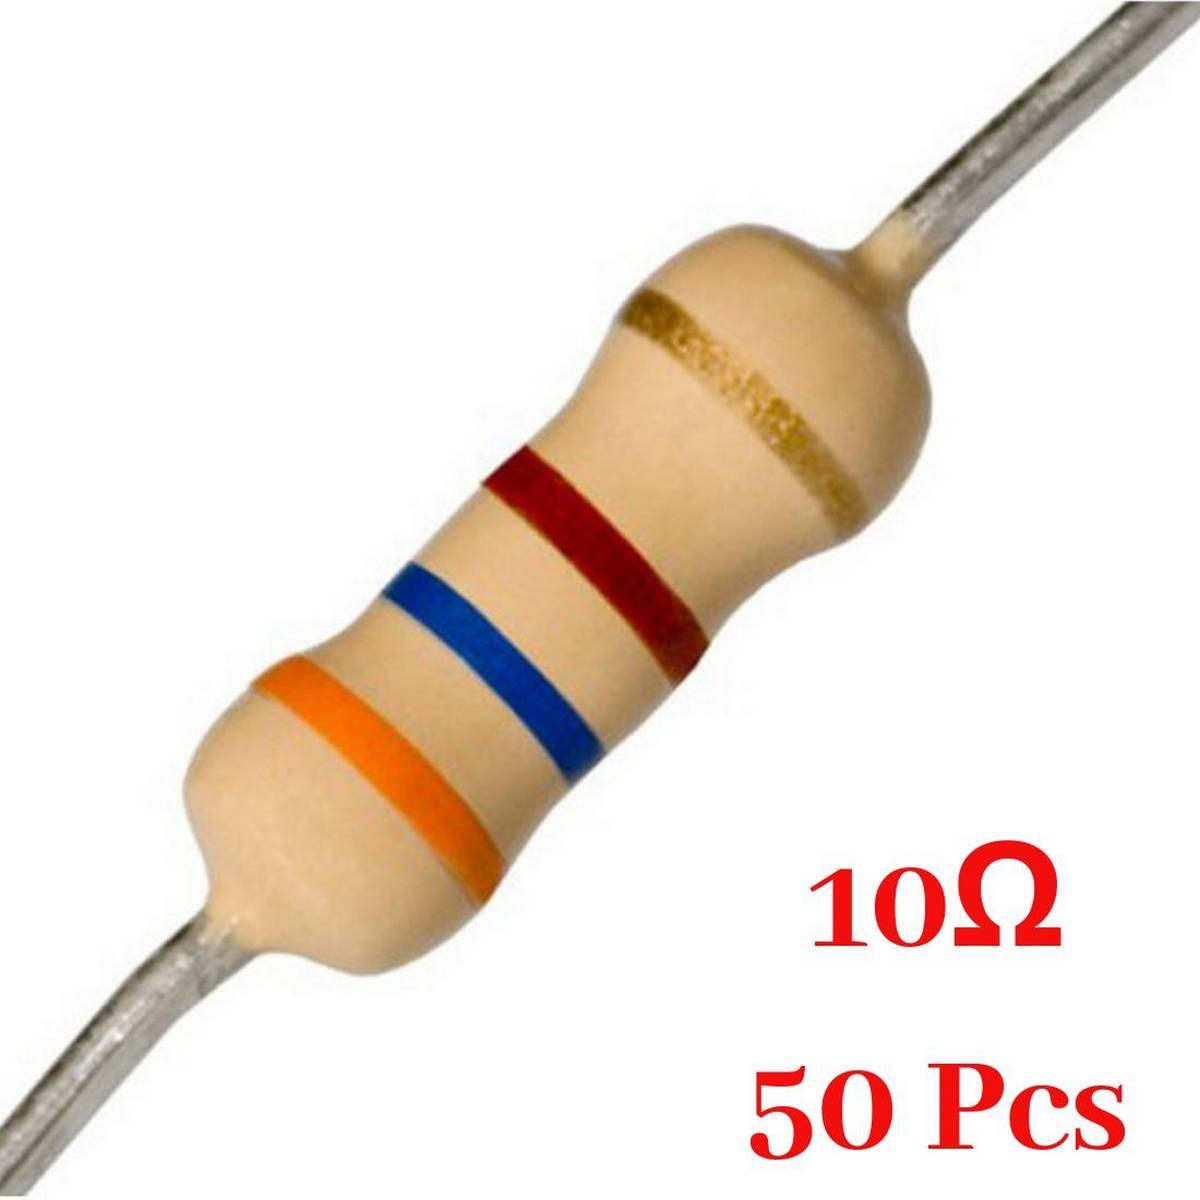 50 Pcs- 10 Ohm resistor